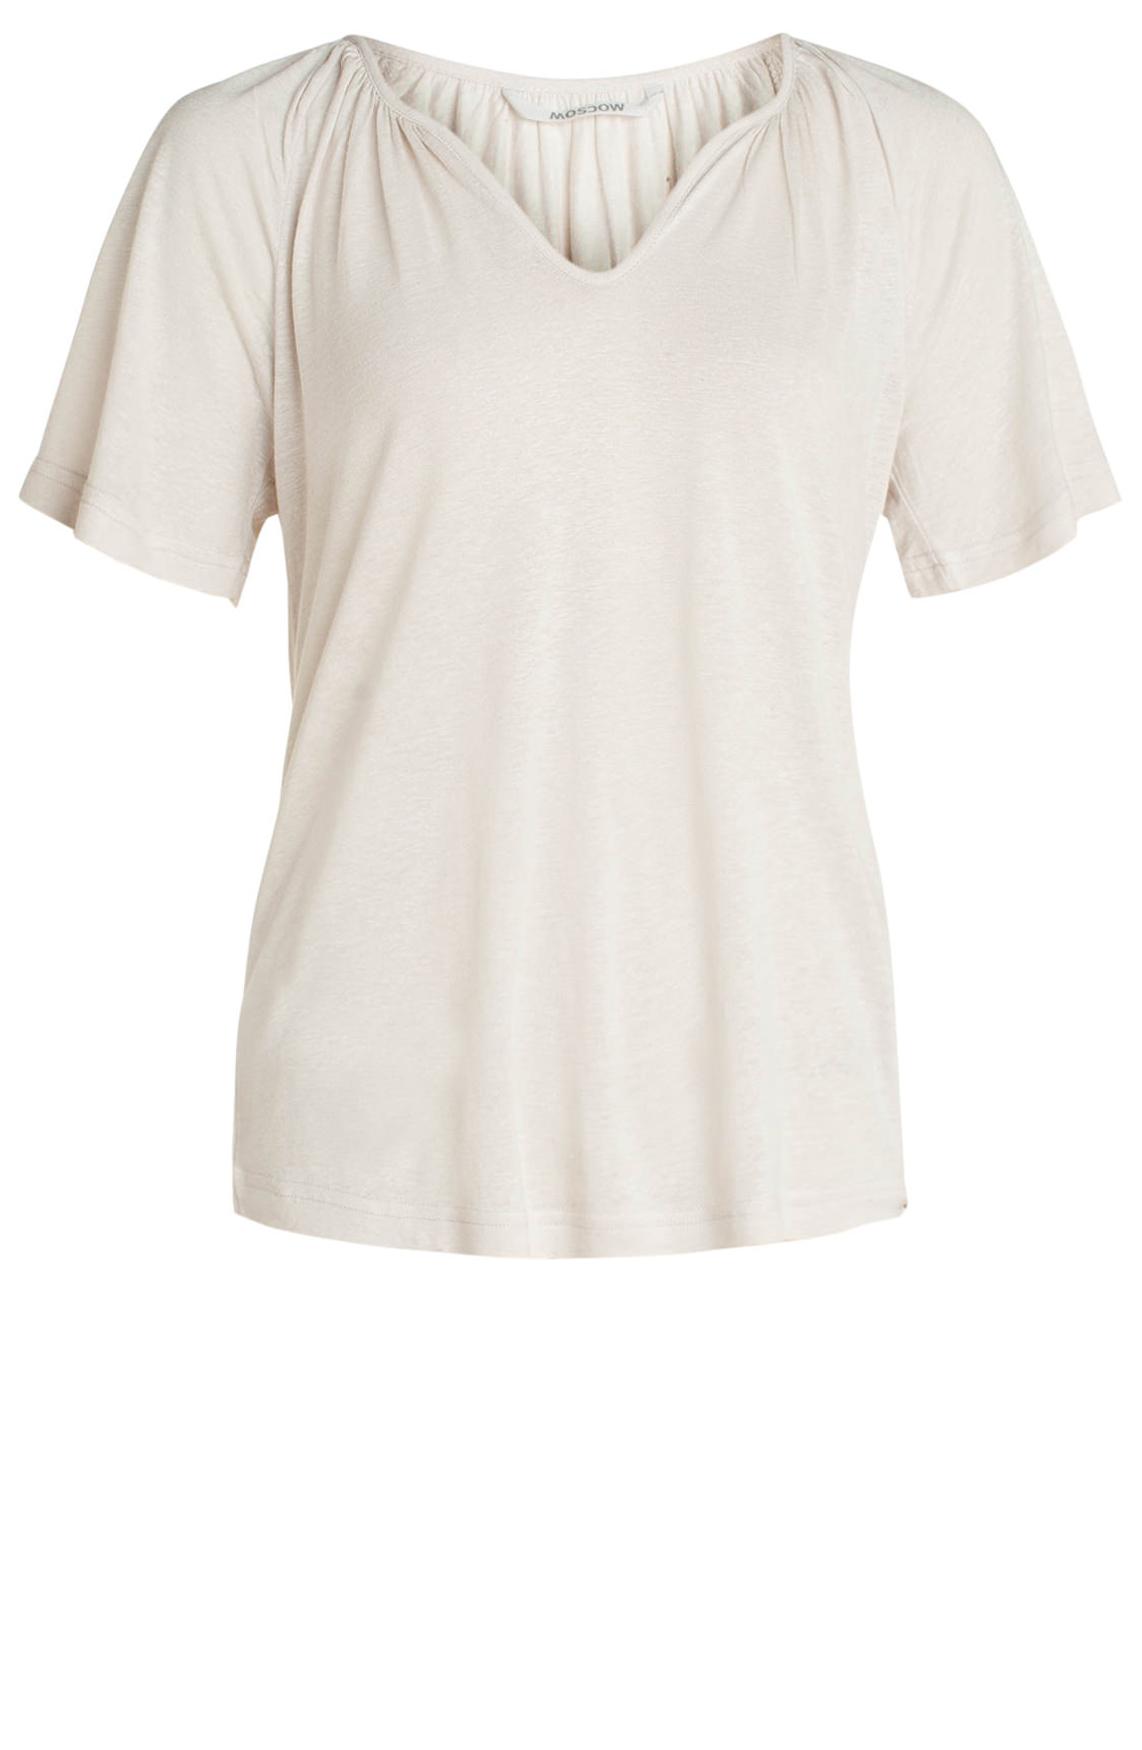 Moscow Dames Shirt with V-neck Ecru